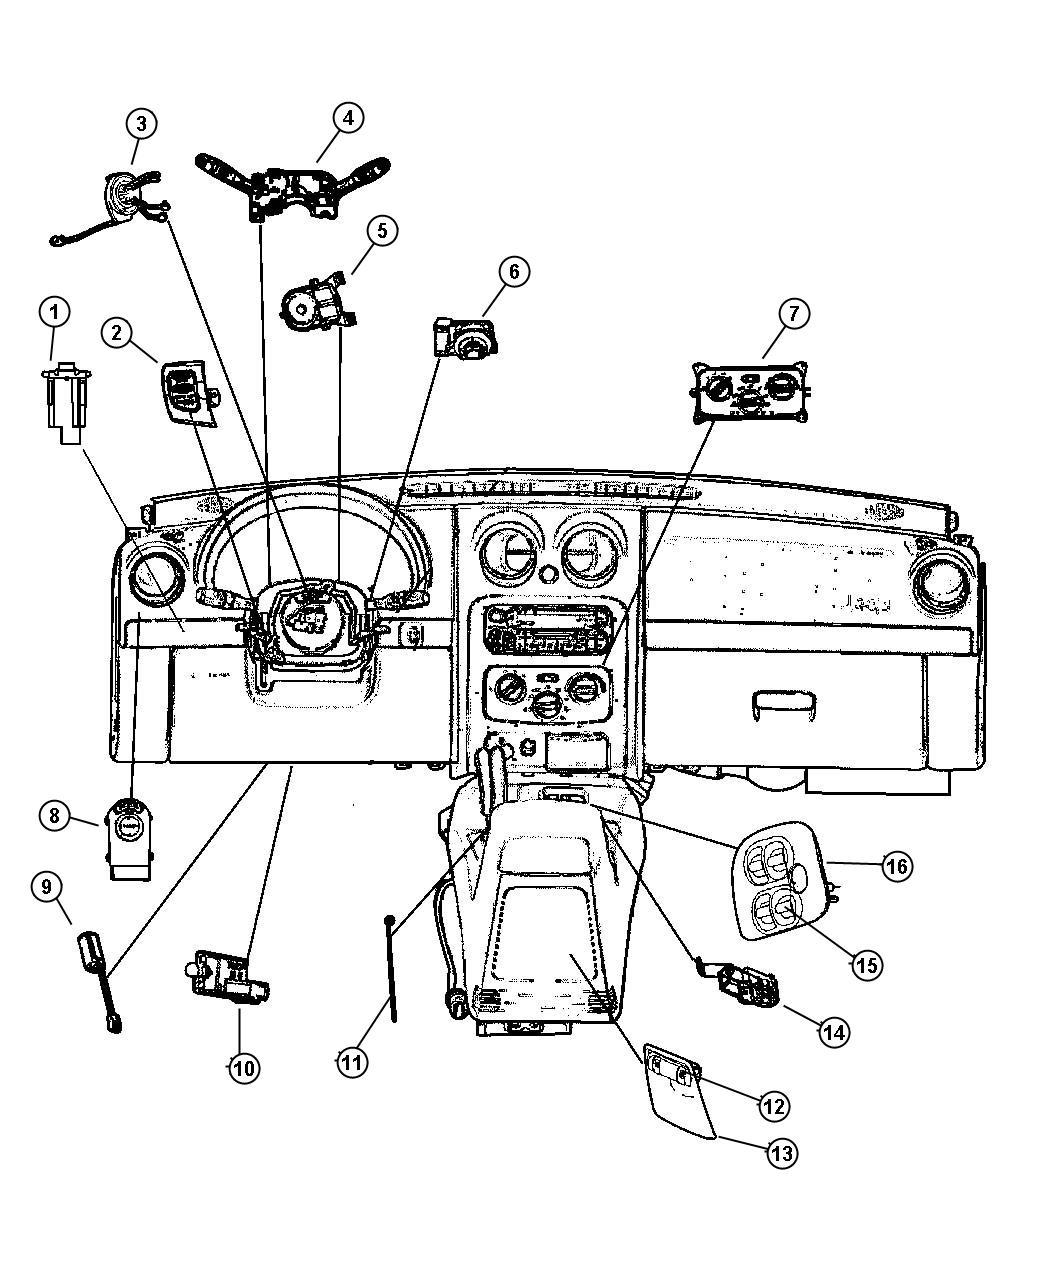 Chrysler Pt Cruiser Switch Ignition Tilteuropean